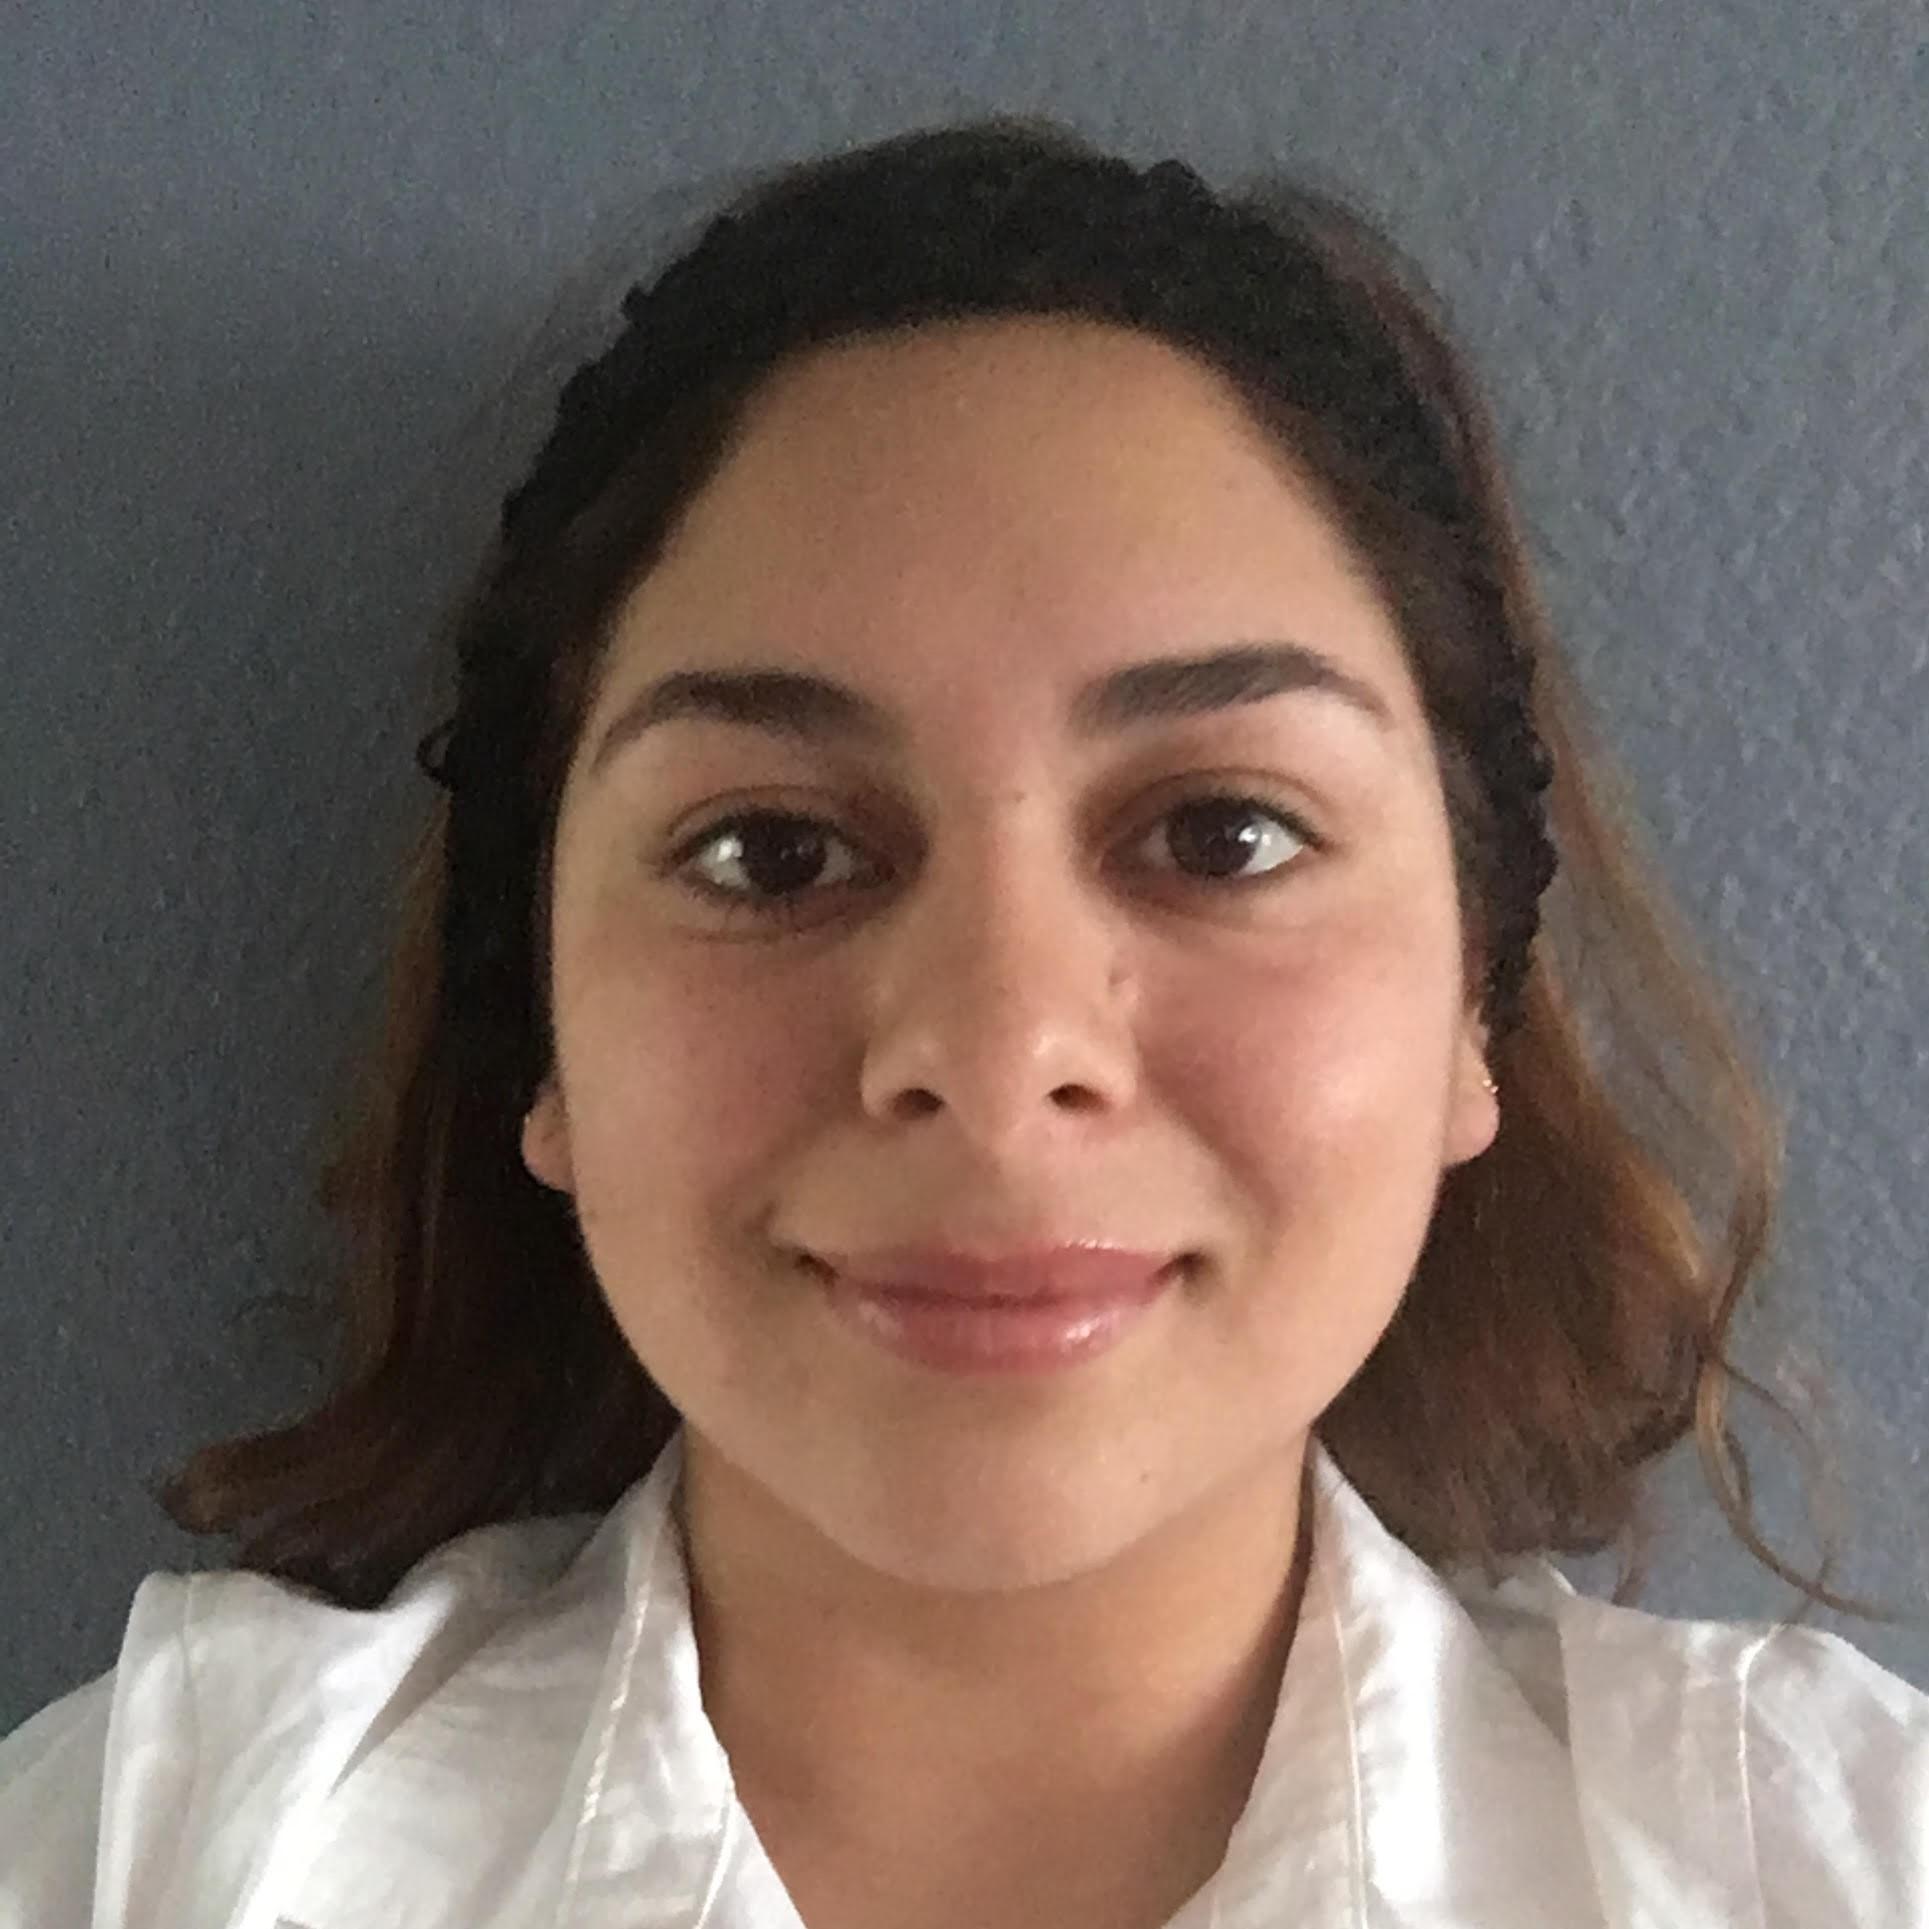 Vanessa Muñoz